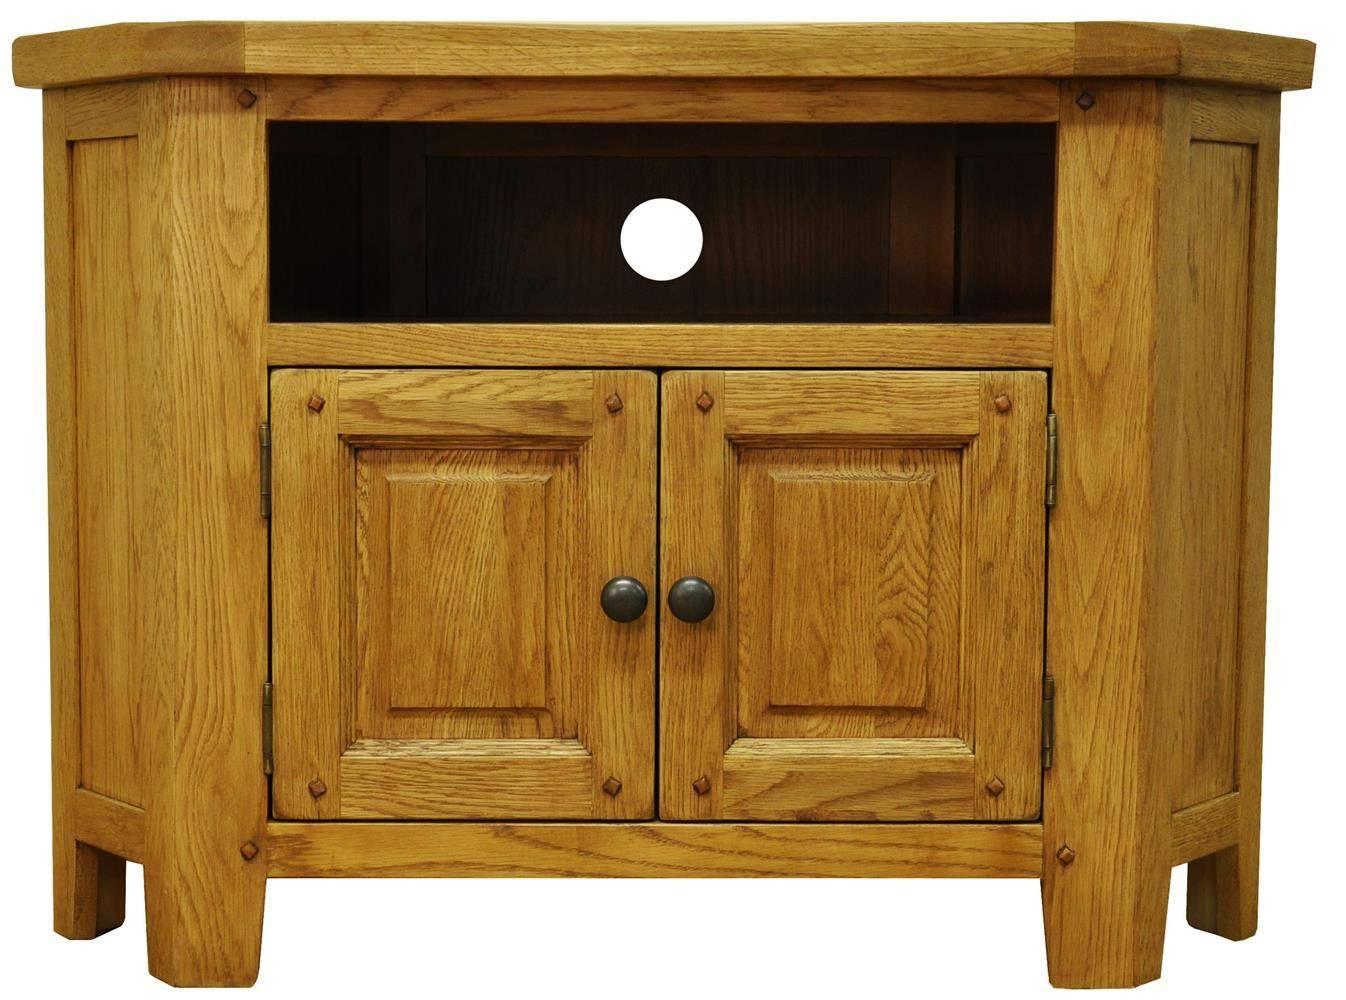 Tv Cabinets : Stanton Rustic Oak Corner Tv Unitstanton Rustic Oak with regard to Oak Corner Tv Cabinets (Image 14 of 15)